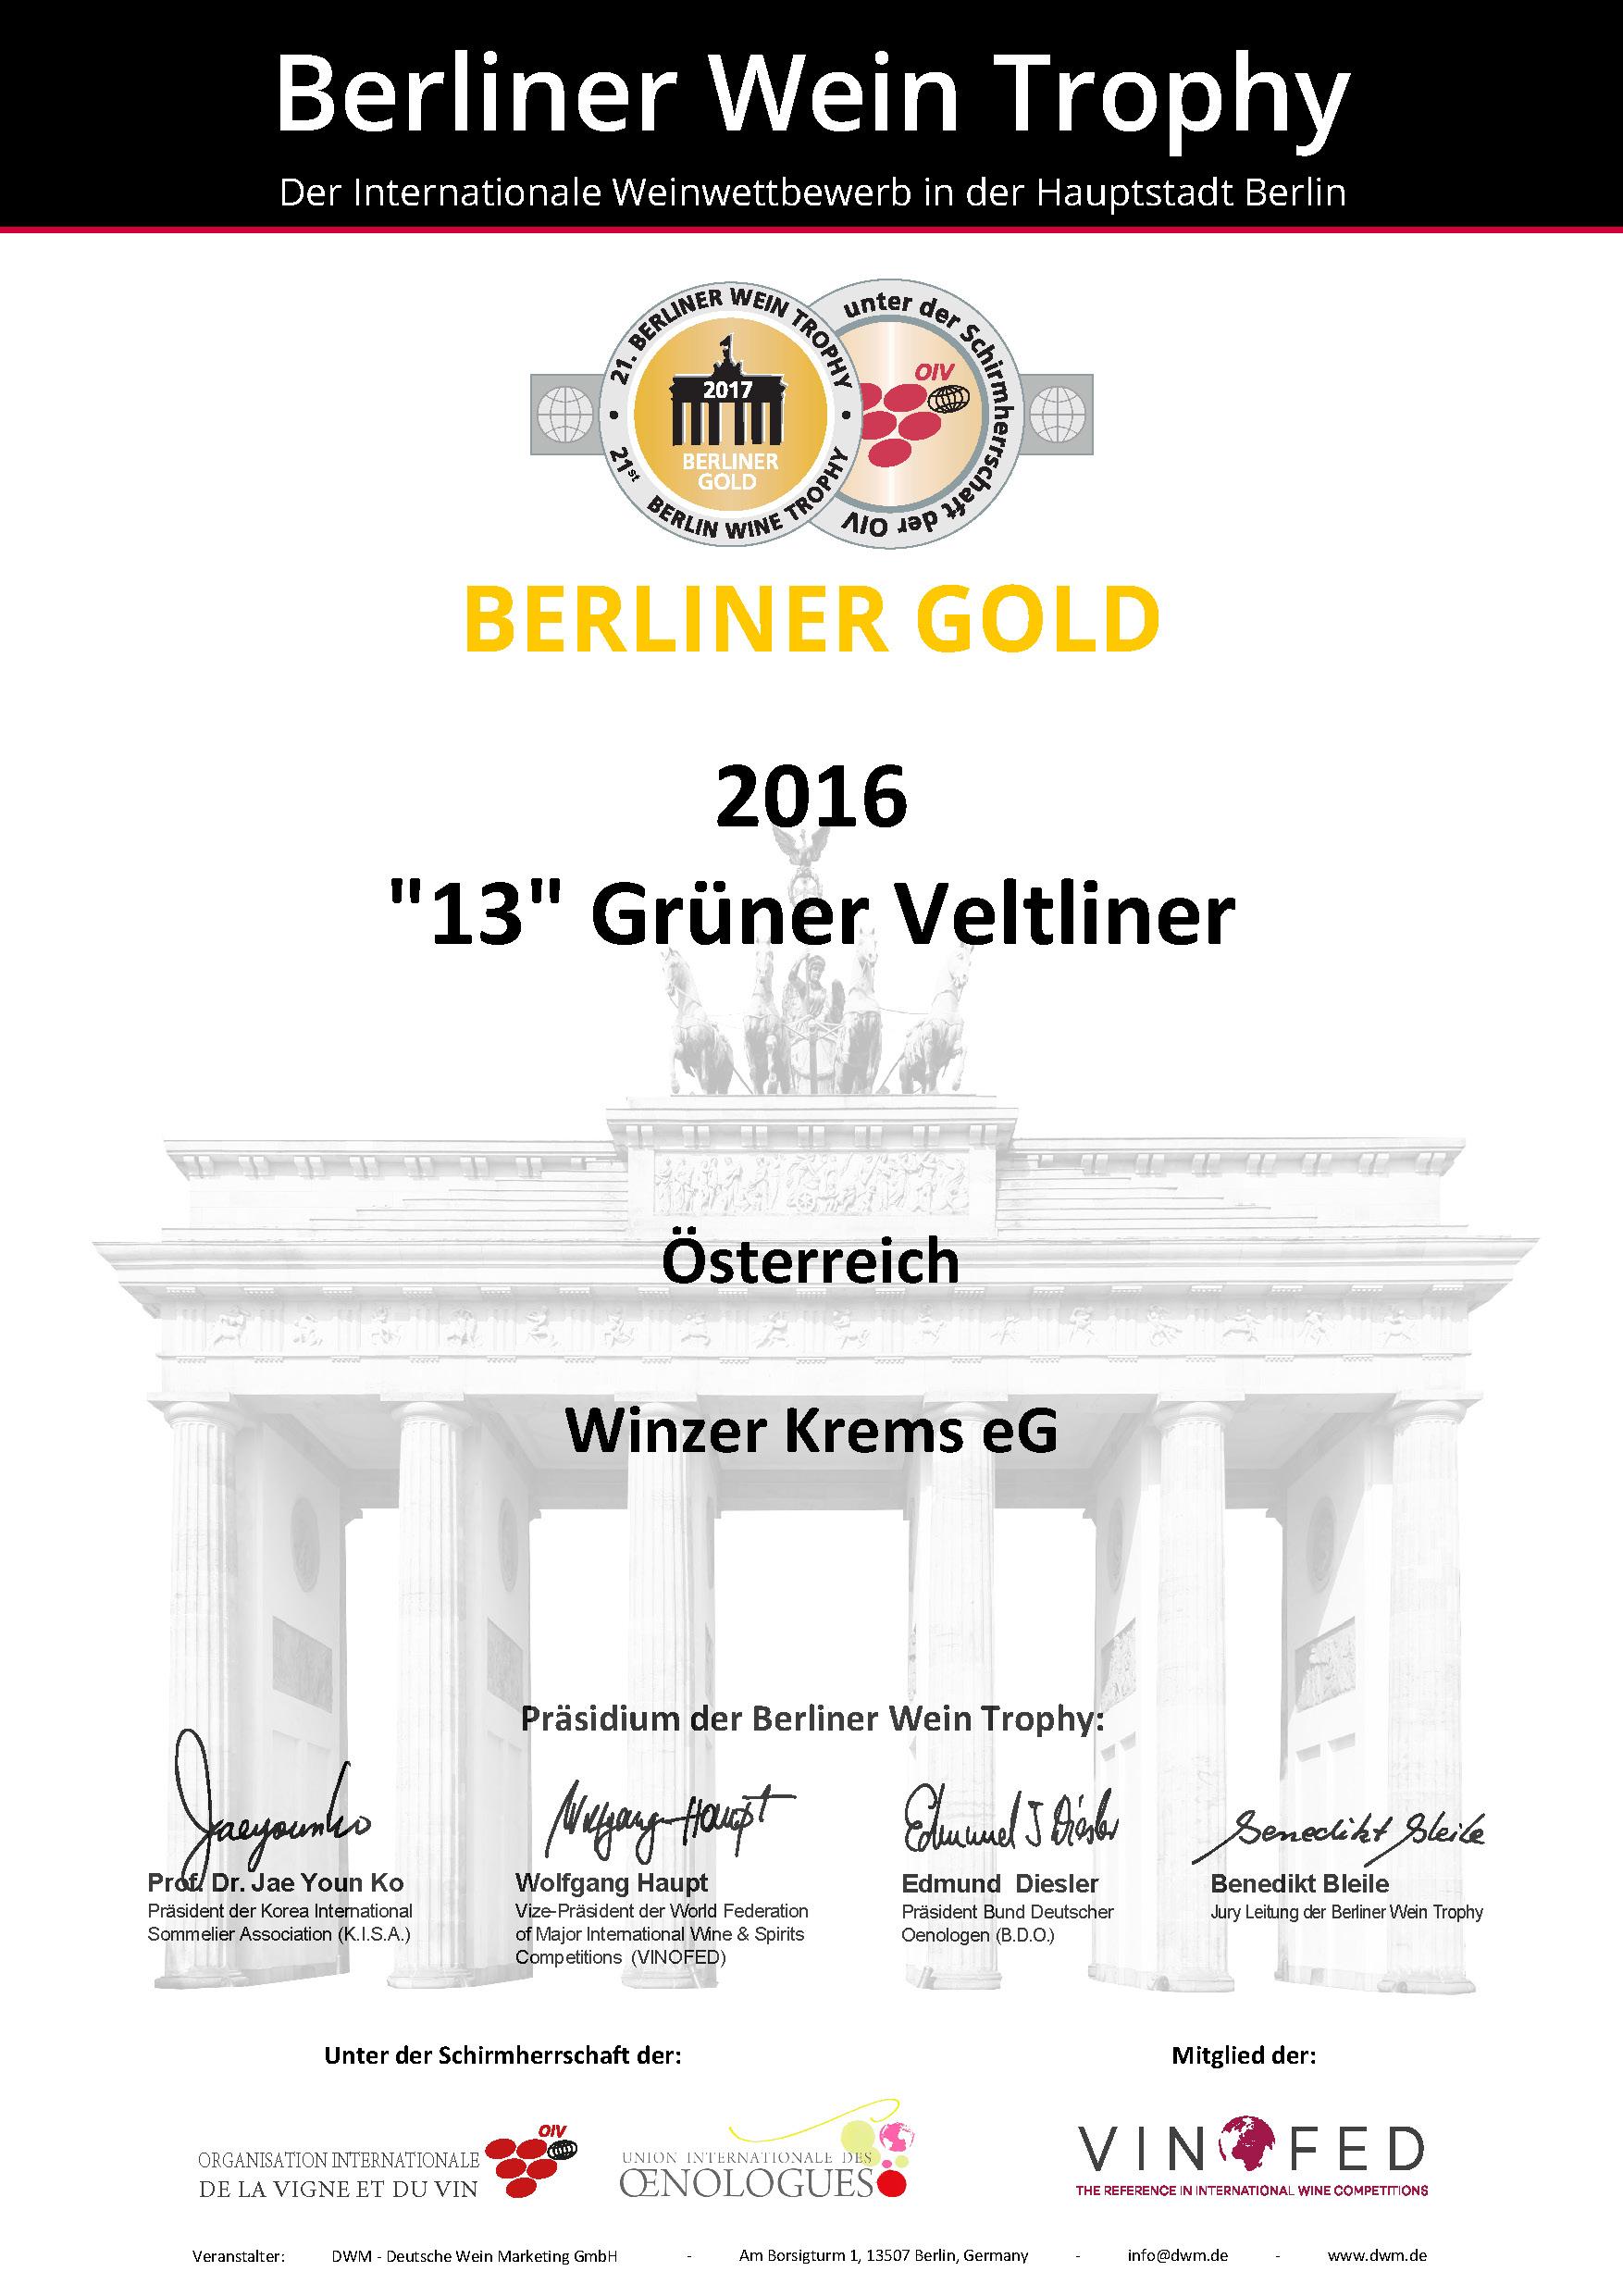 Februar 2017: Berliner Gold bei der Berliner Wine Trophy 2017